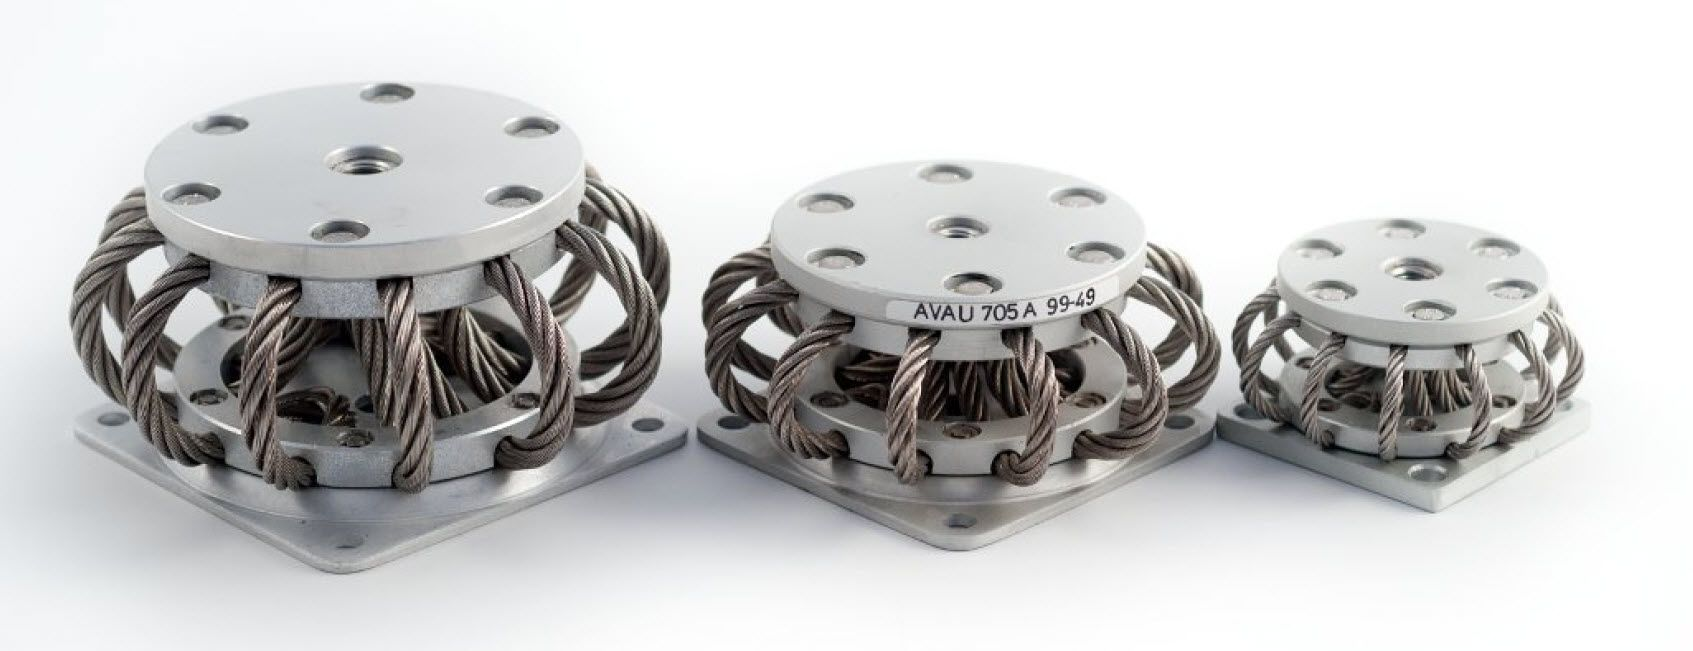 Wire rope isolator anti-vibration mount - 1 - 100 daN | AVAU series ...